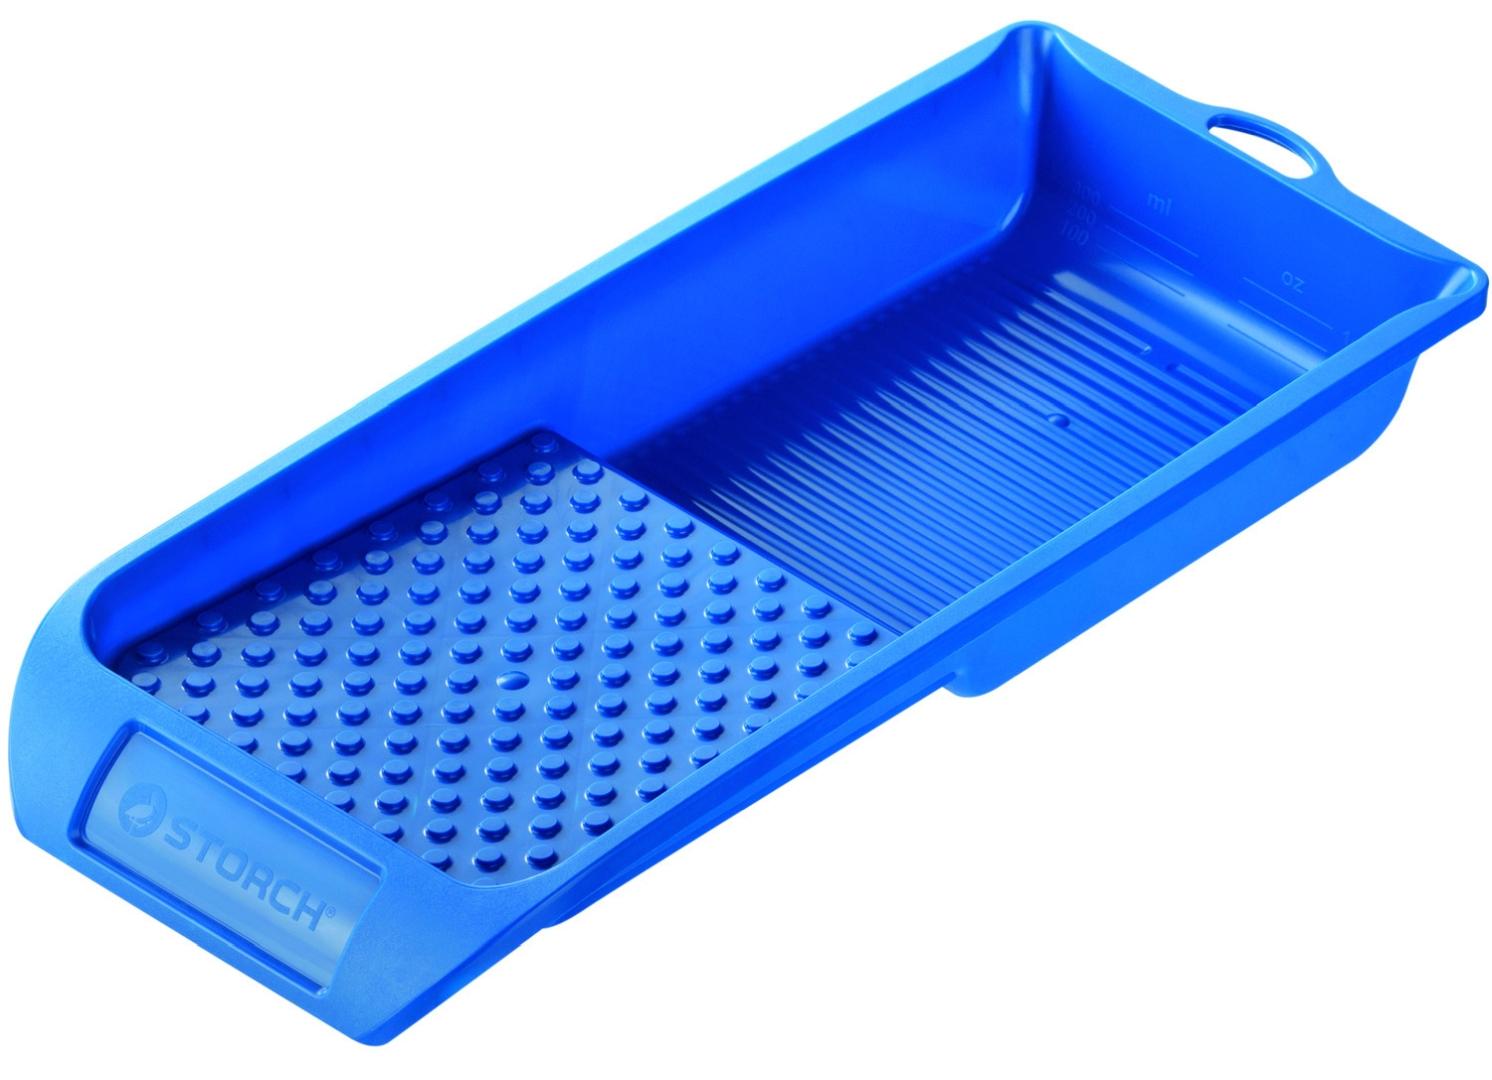 STORCH Farbwanne Kunststoff, blau, 14 x 29 cm